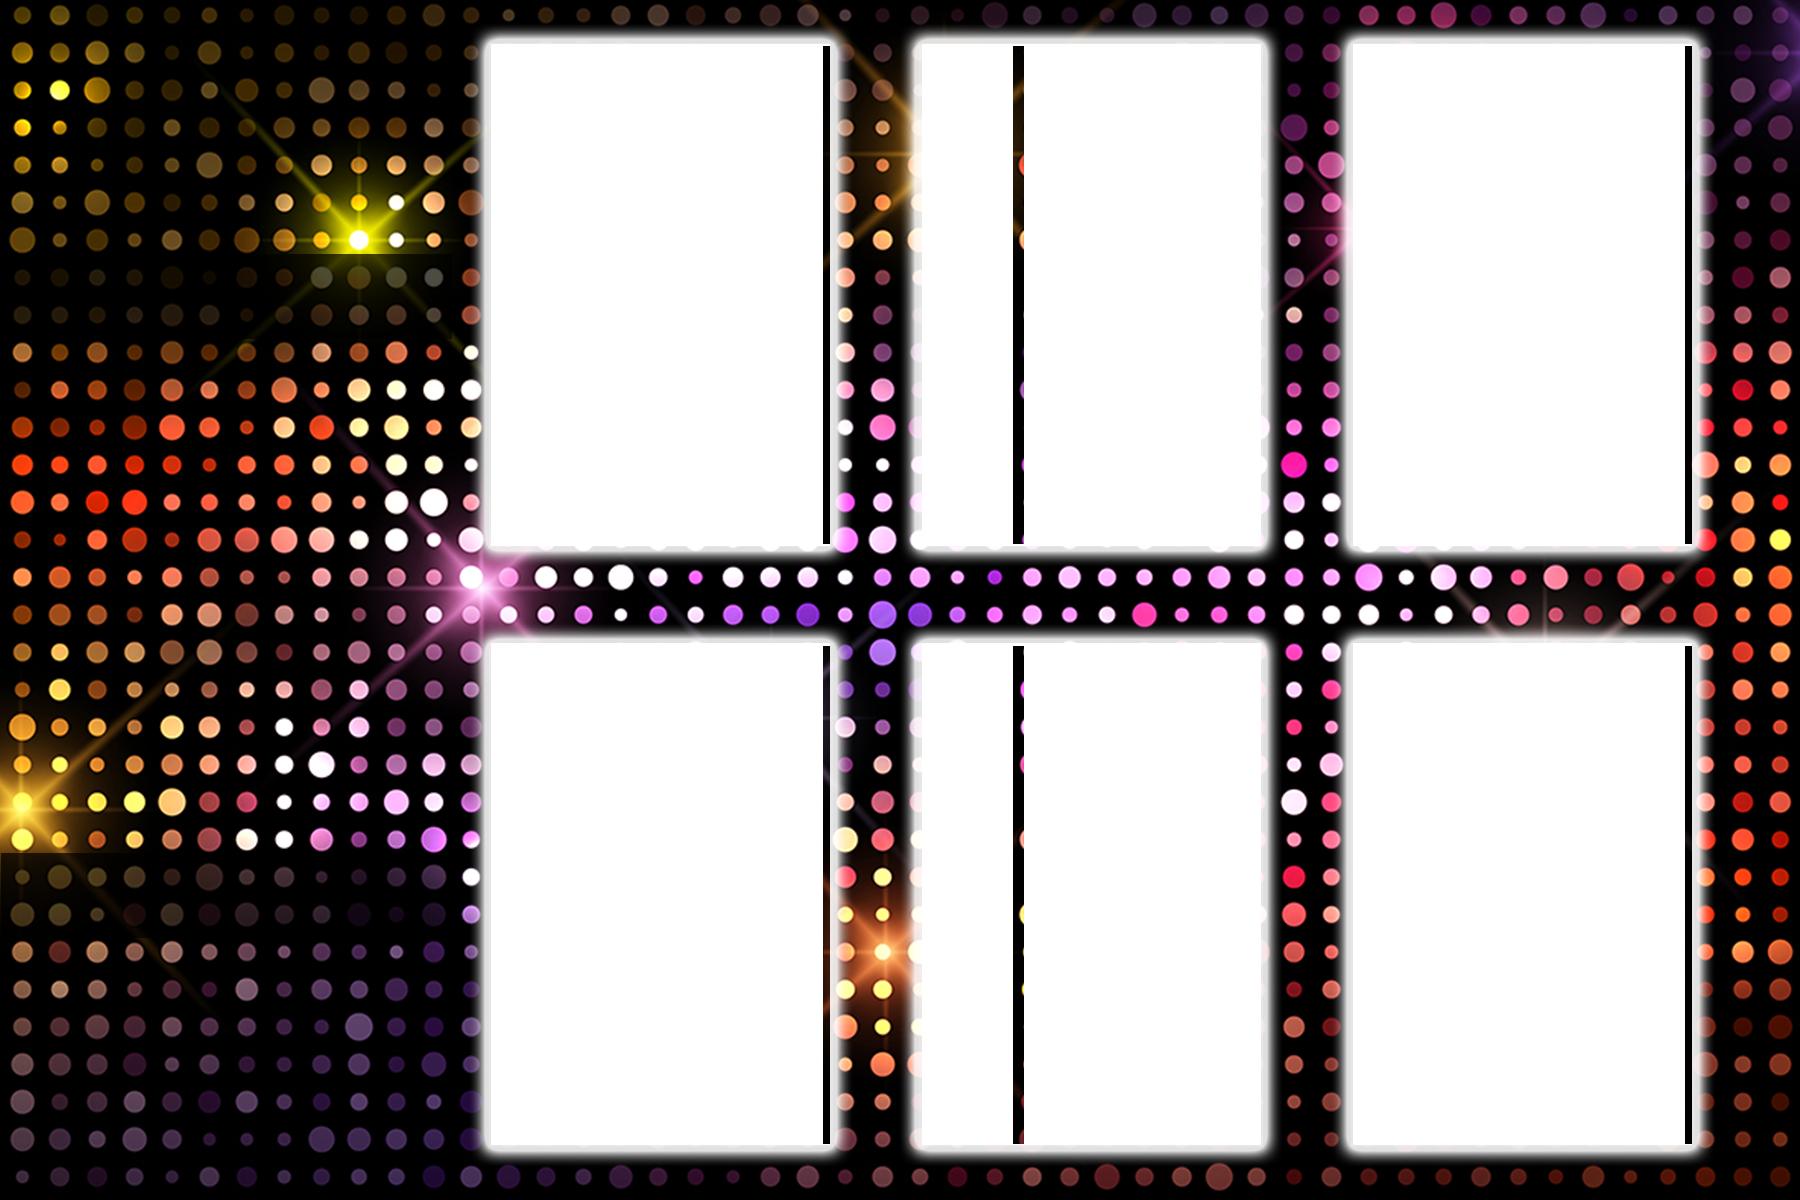 Strip_V3_Disco.png